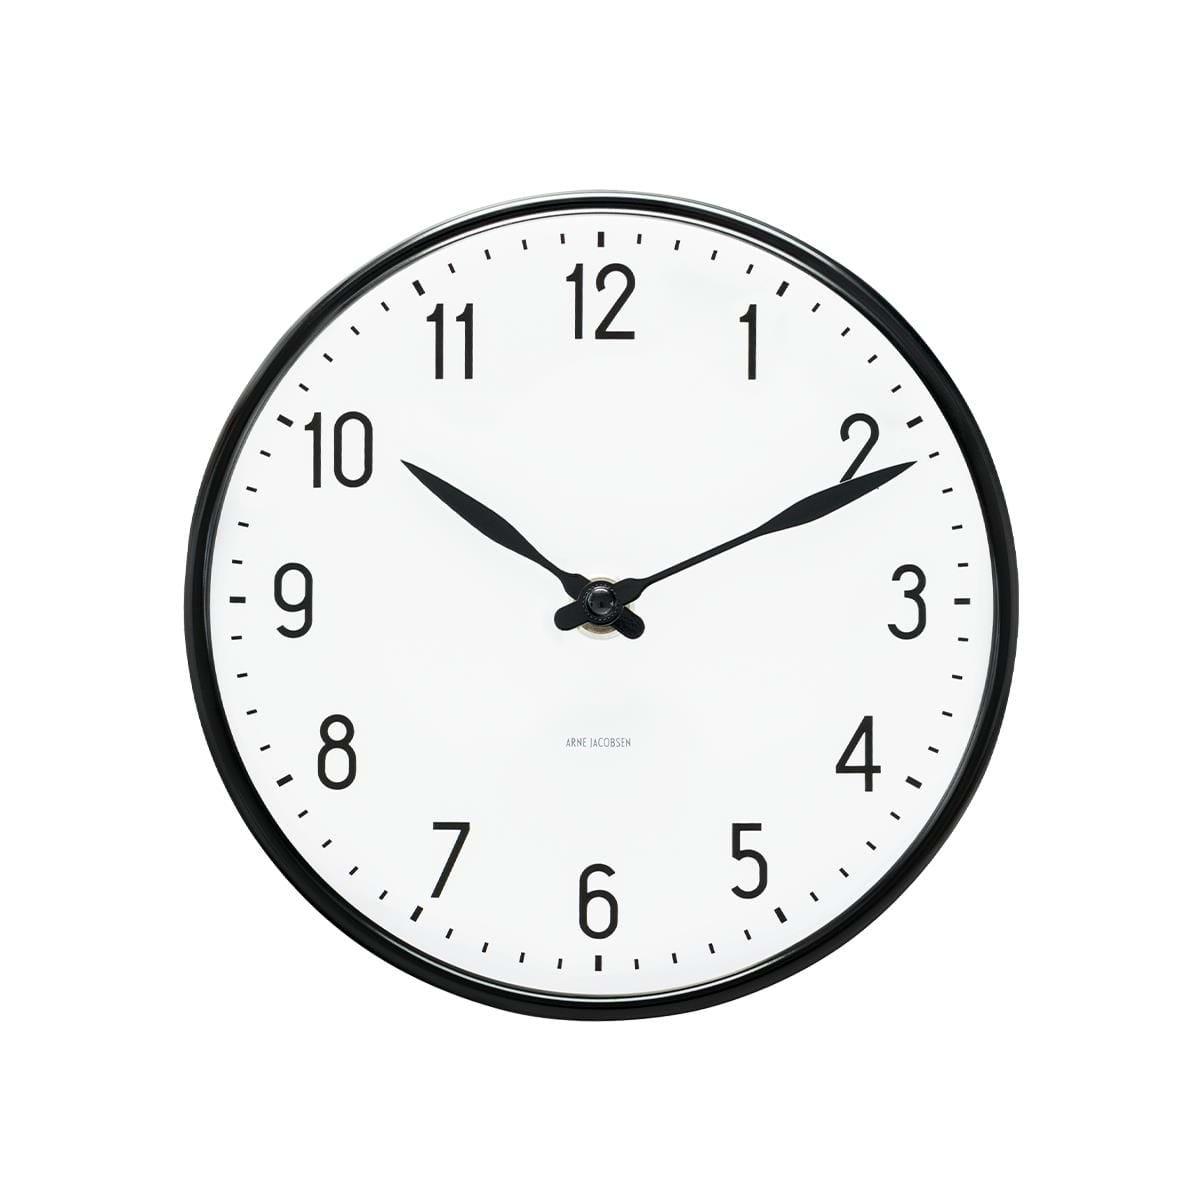 Arne Jacobsen - Station Wall Clock Ø 29 cm - Black (43643)